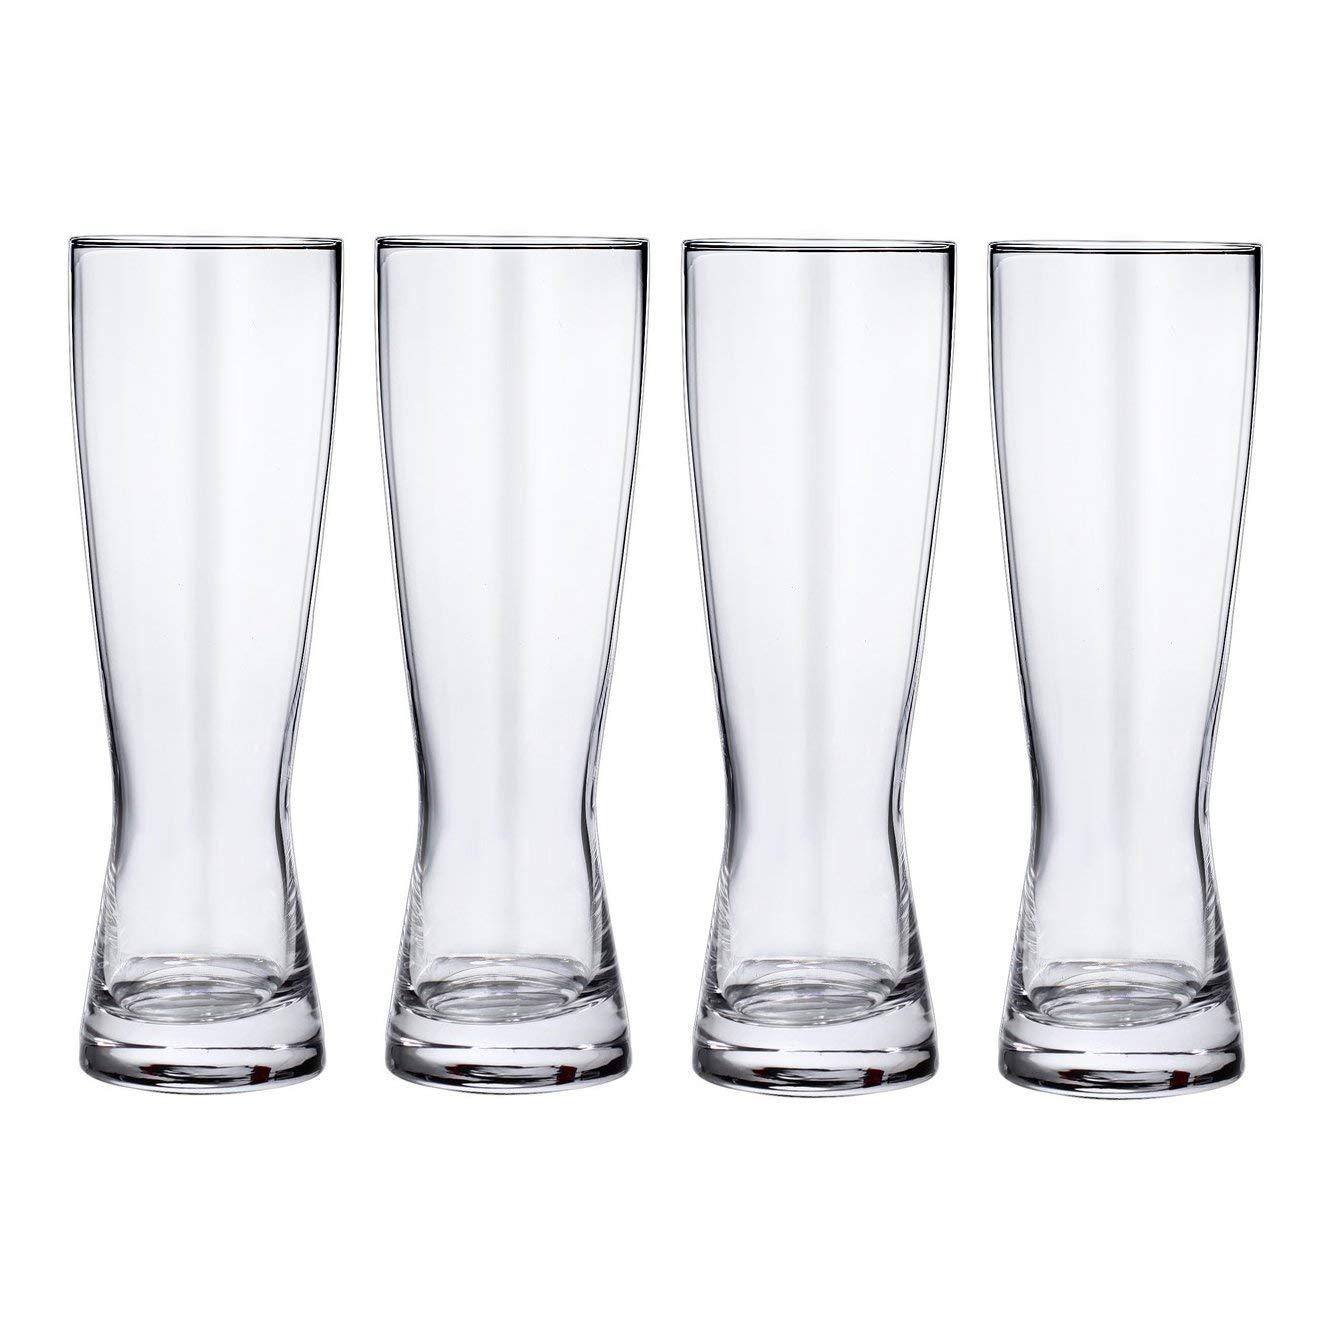 Set of 4 Lead-Free Crystal Pilsner Beer Glasses, 20 Ounces